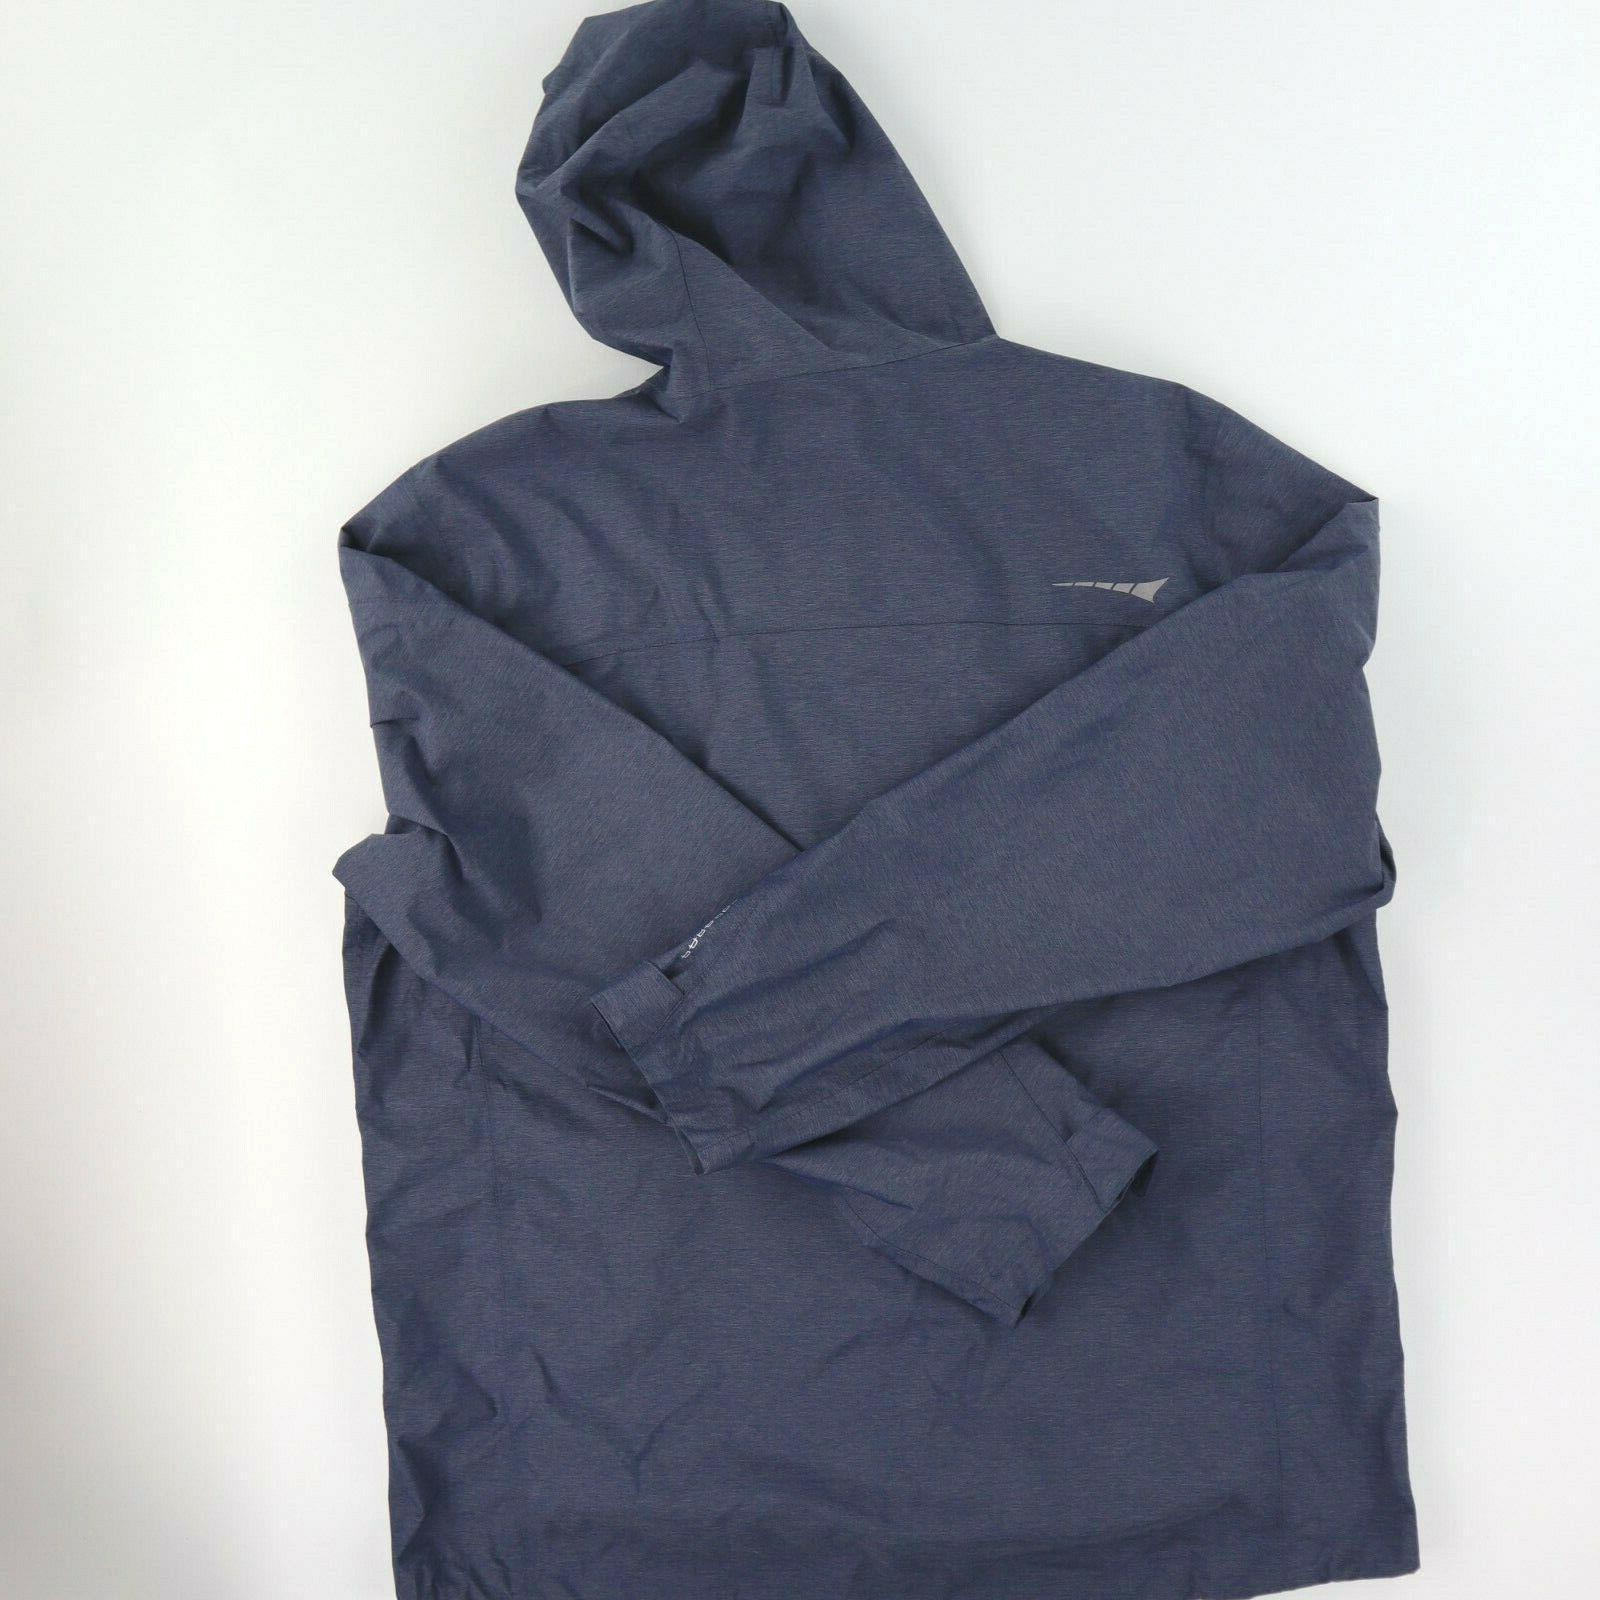 Paradox Men's Rain Hooded Jacket Windbreaker Full Zip